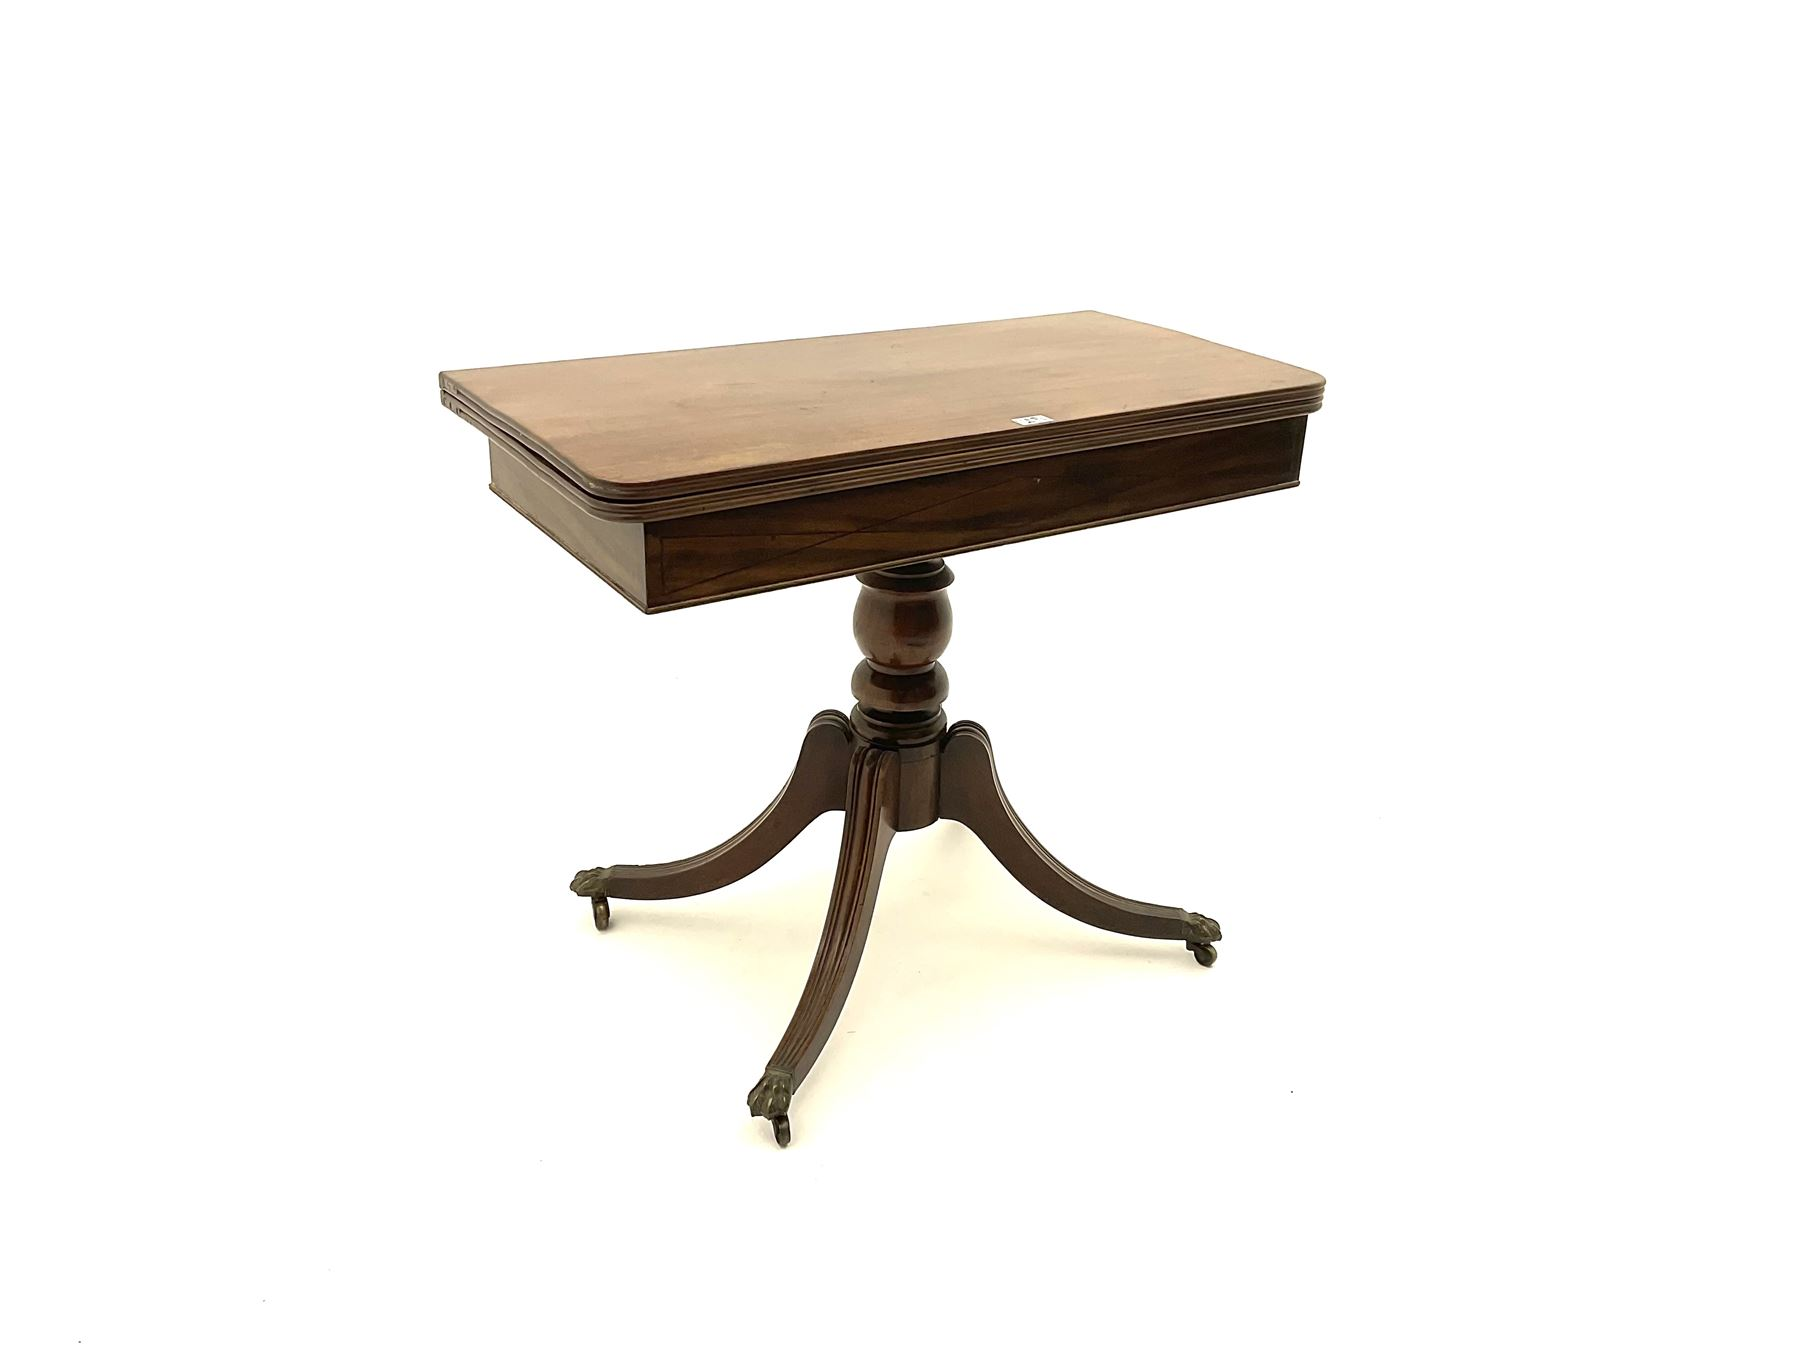 Regency mahogany pedestal table - Image 3 of 3